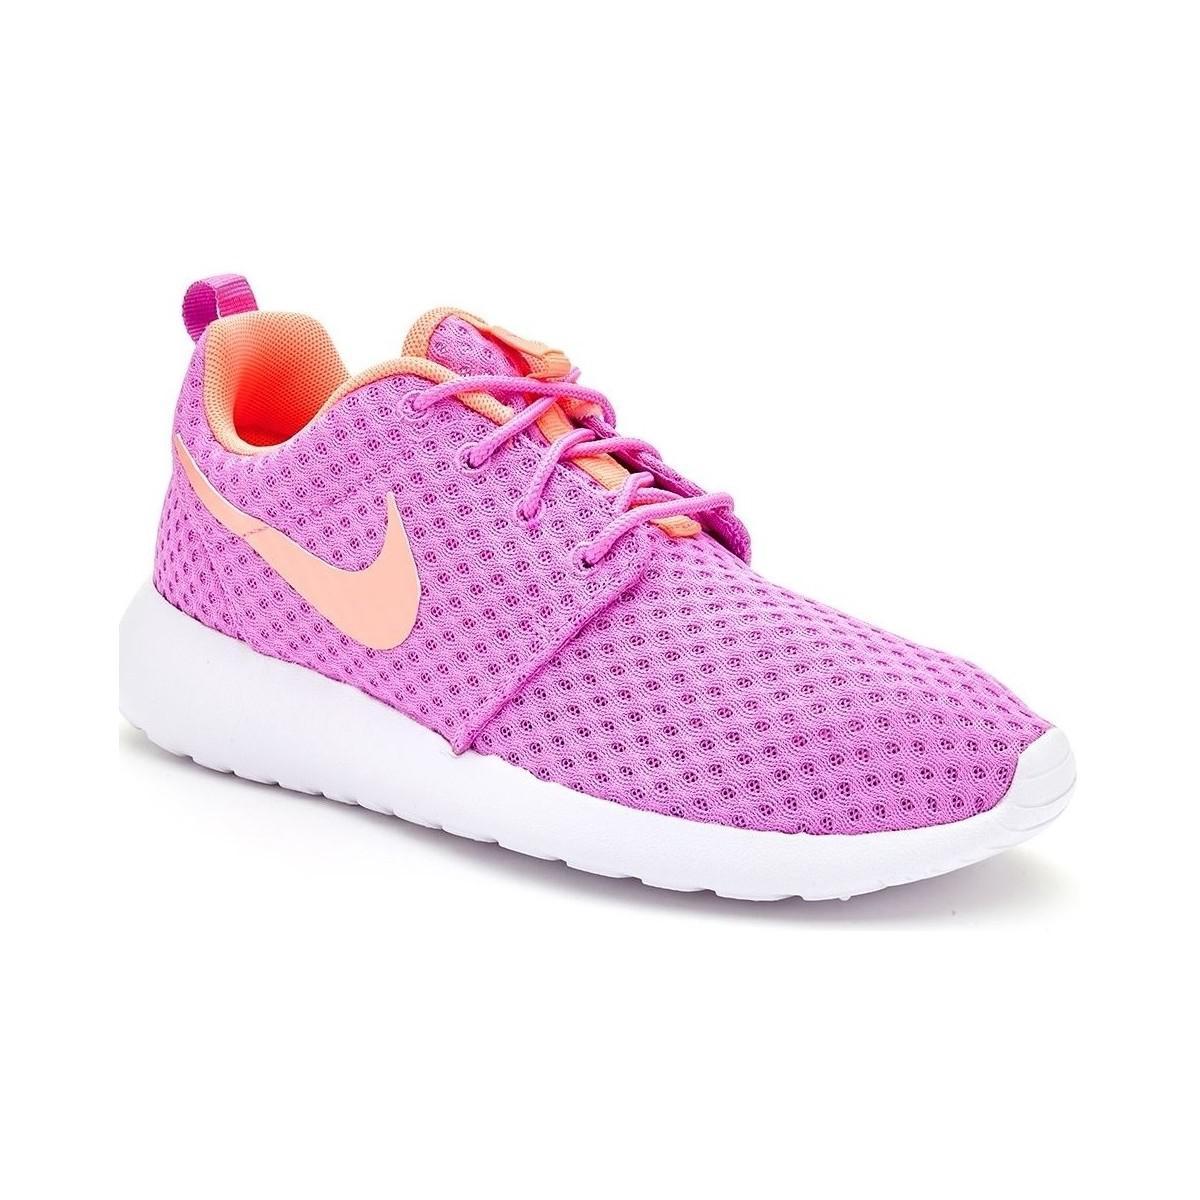 a6cc2f2ffa00b Nike Roshe Run One Br Women Trainers In Fuchsia Glow Lava Glow 724 ...